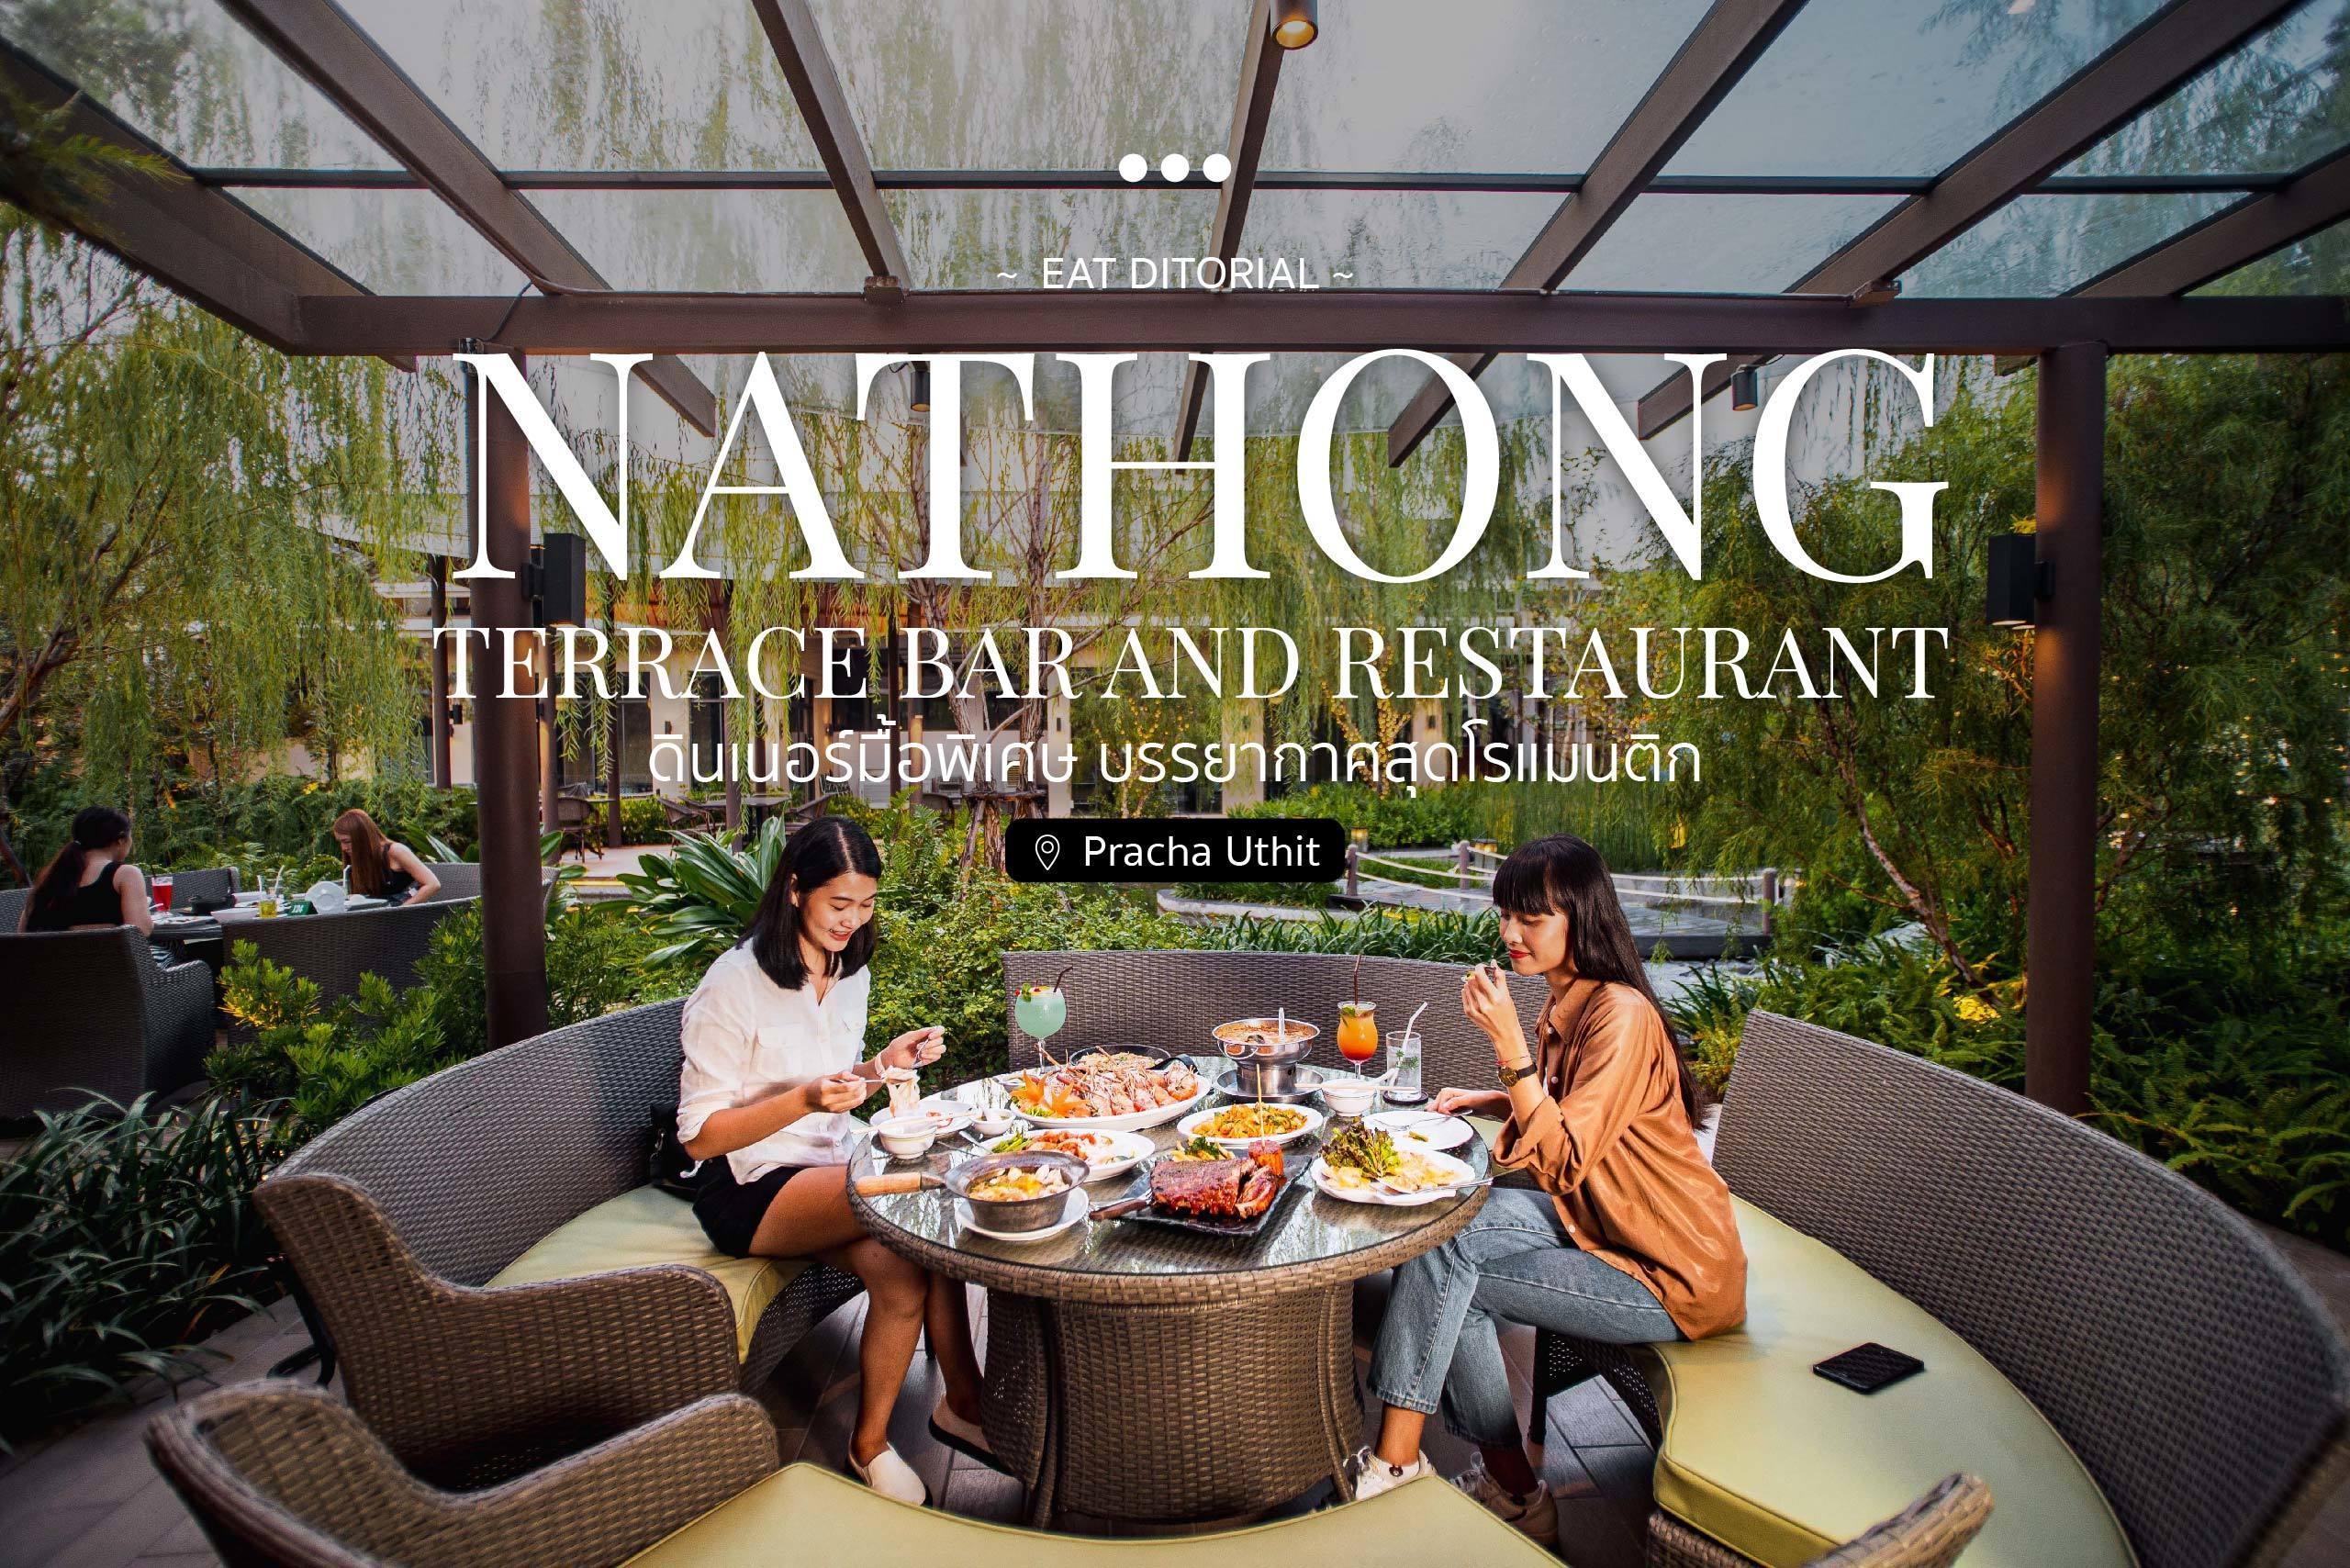 Nathong Terrace Bar and Restaurant ปกweb